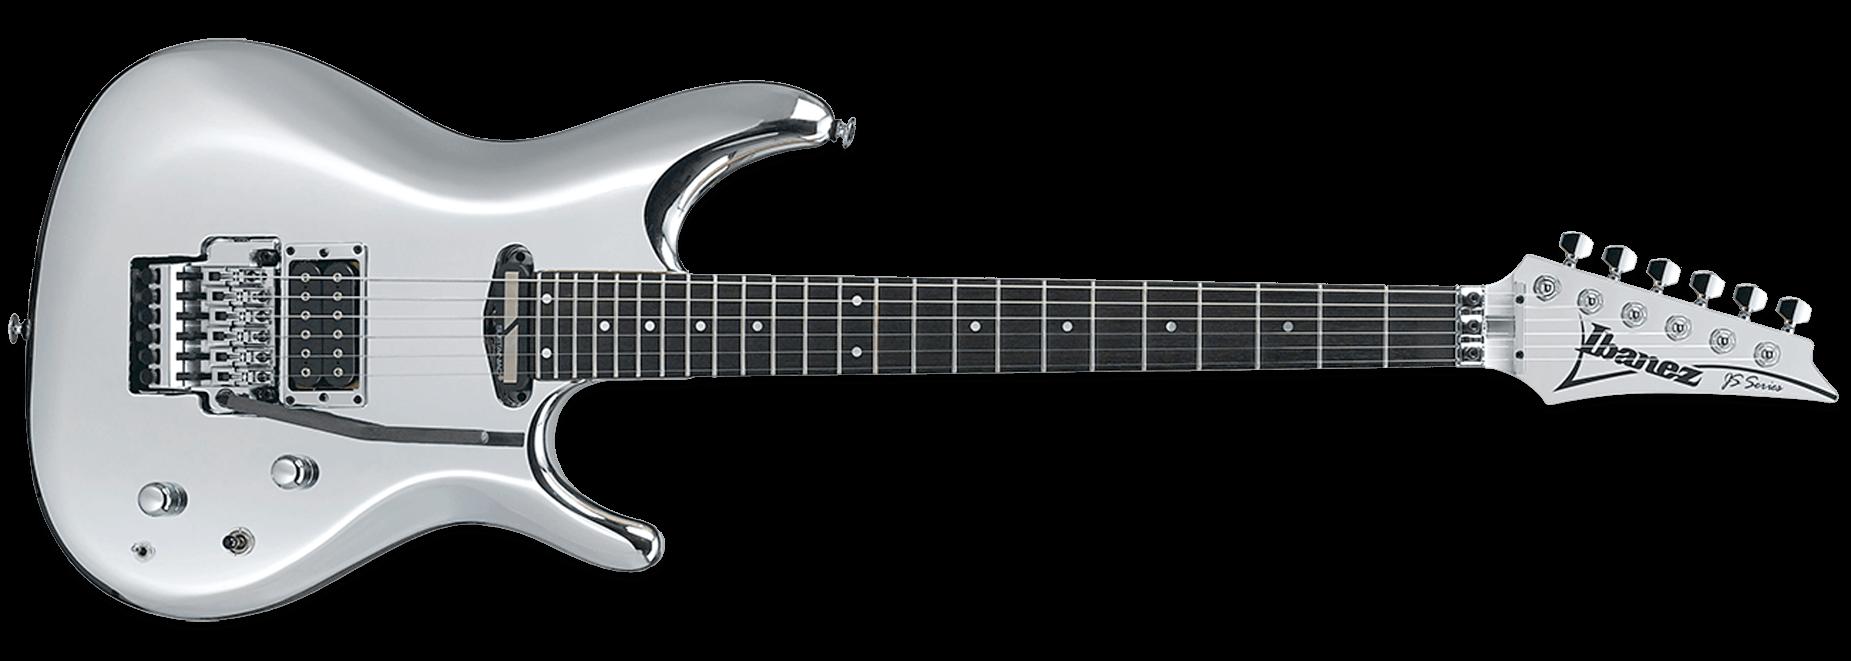 Ibanez Joe Satriani JS1CR30